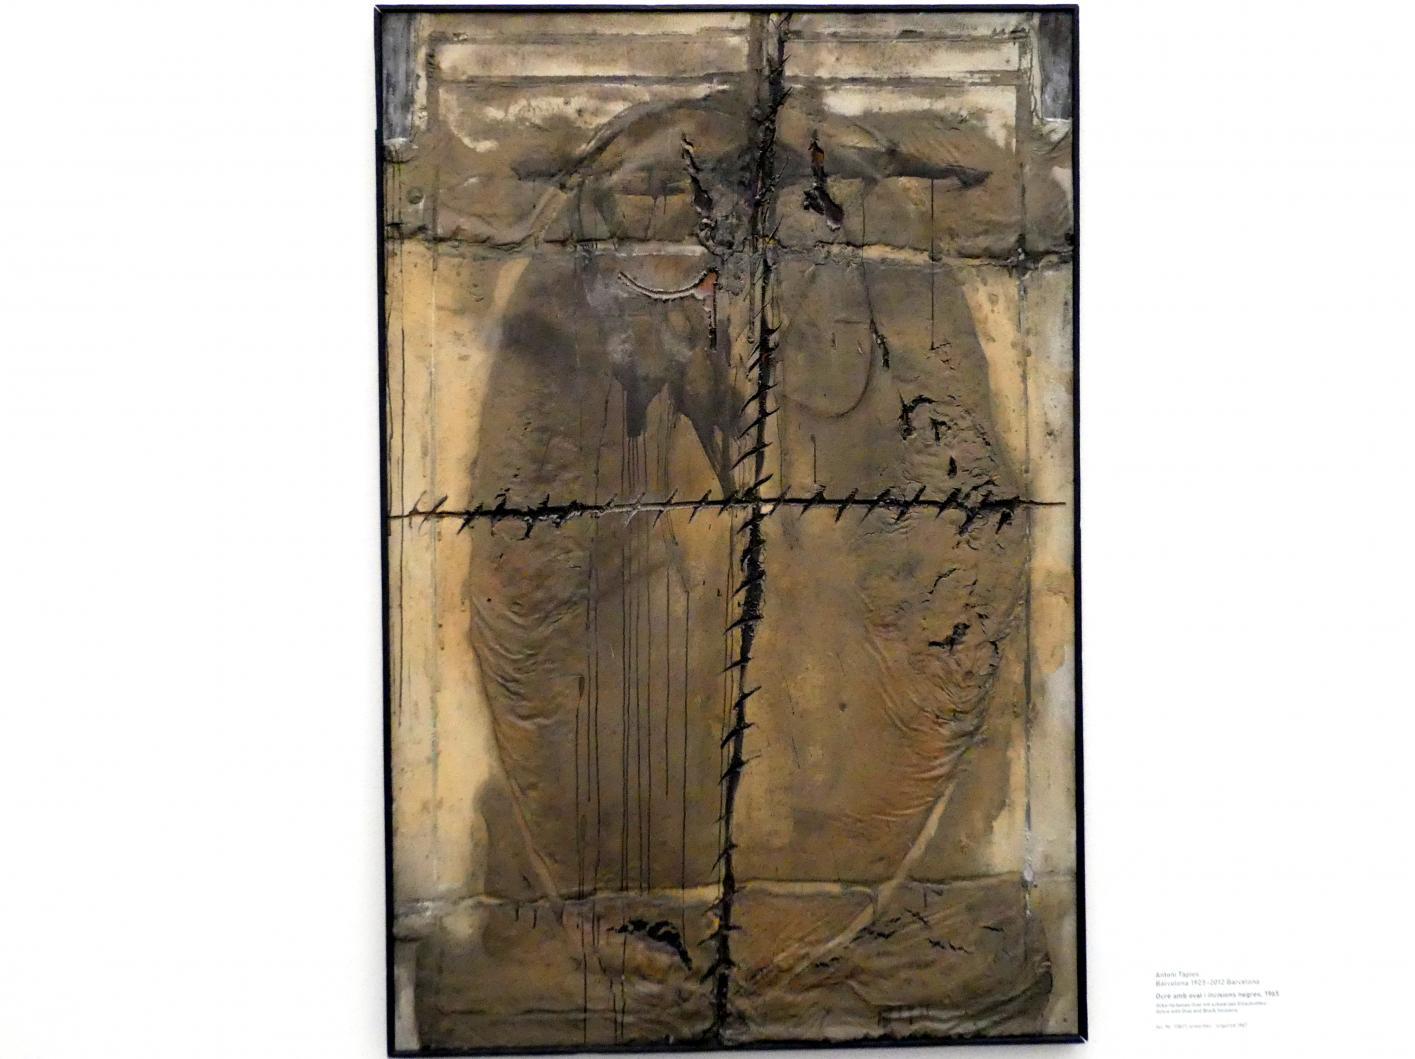 Antoni Tàpies: Ocre amb oval i incisions negres - Ockerfarbenes Oval mit schwarzen Einschnitten, 1965